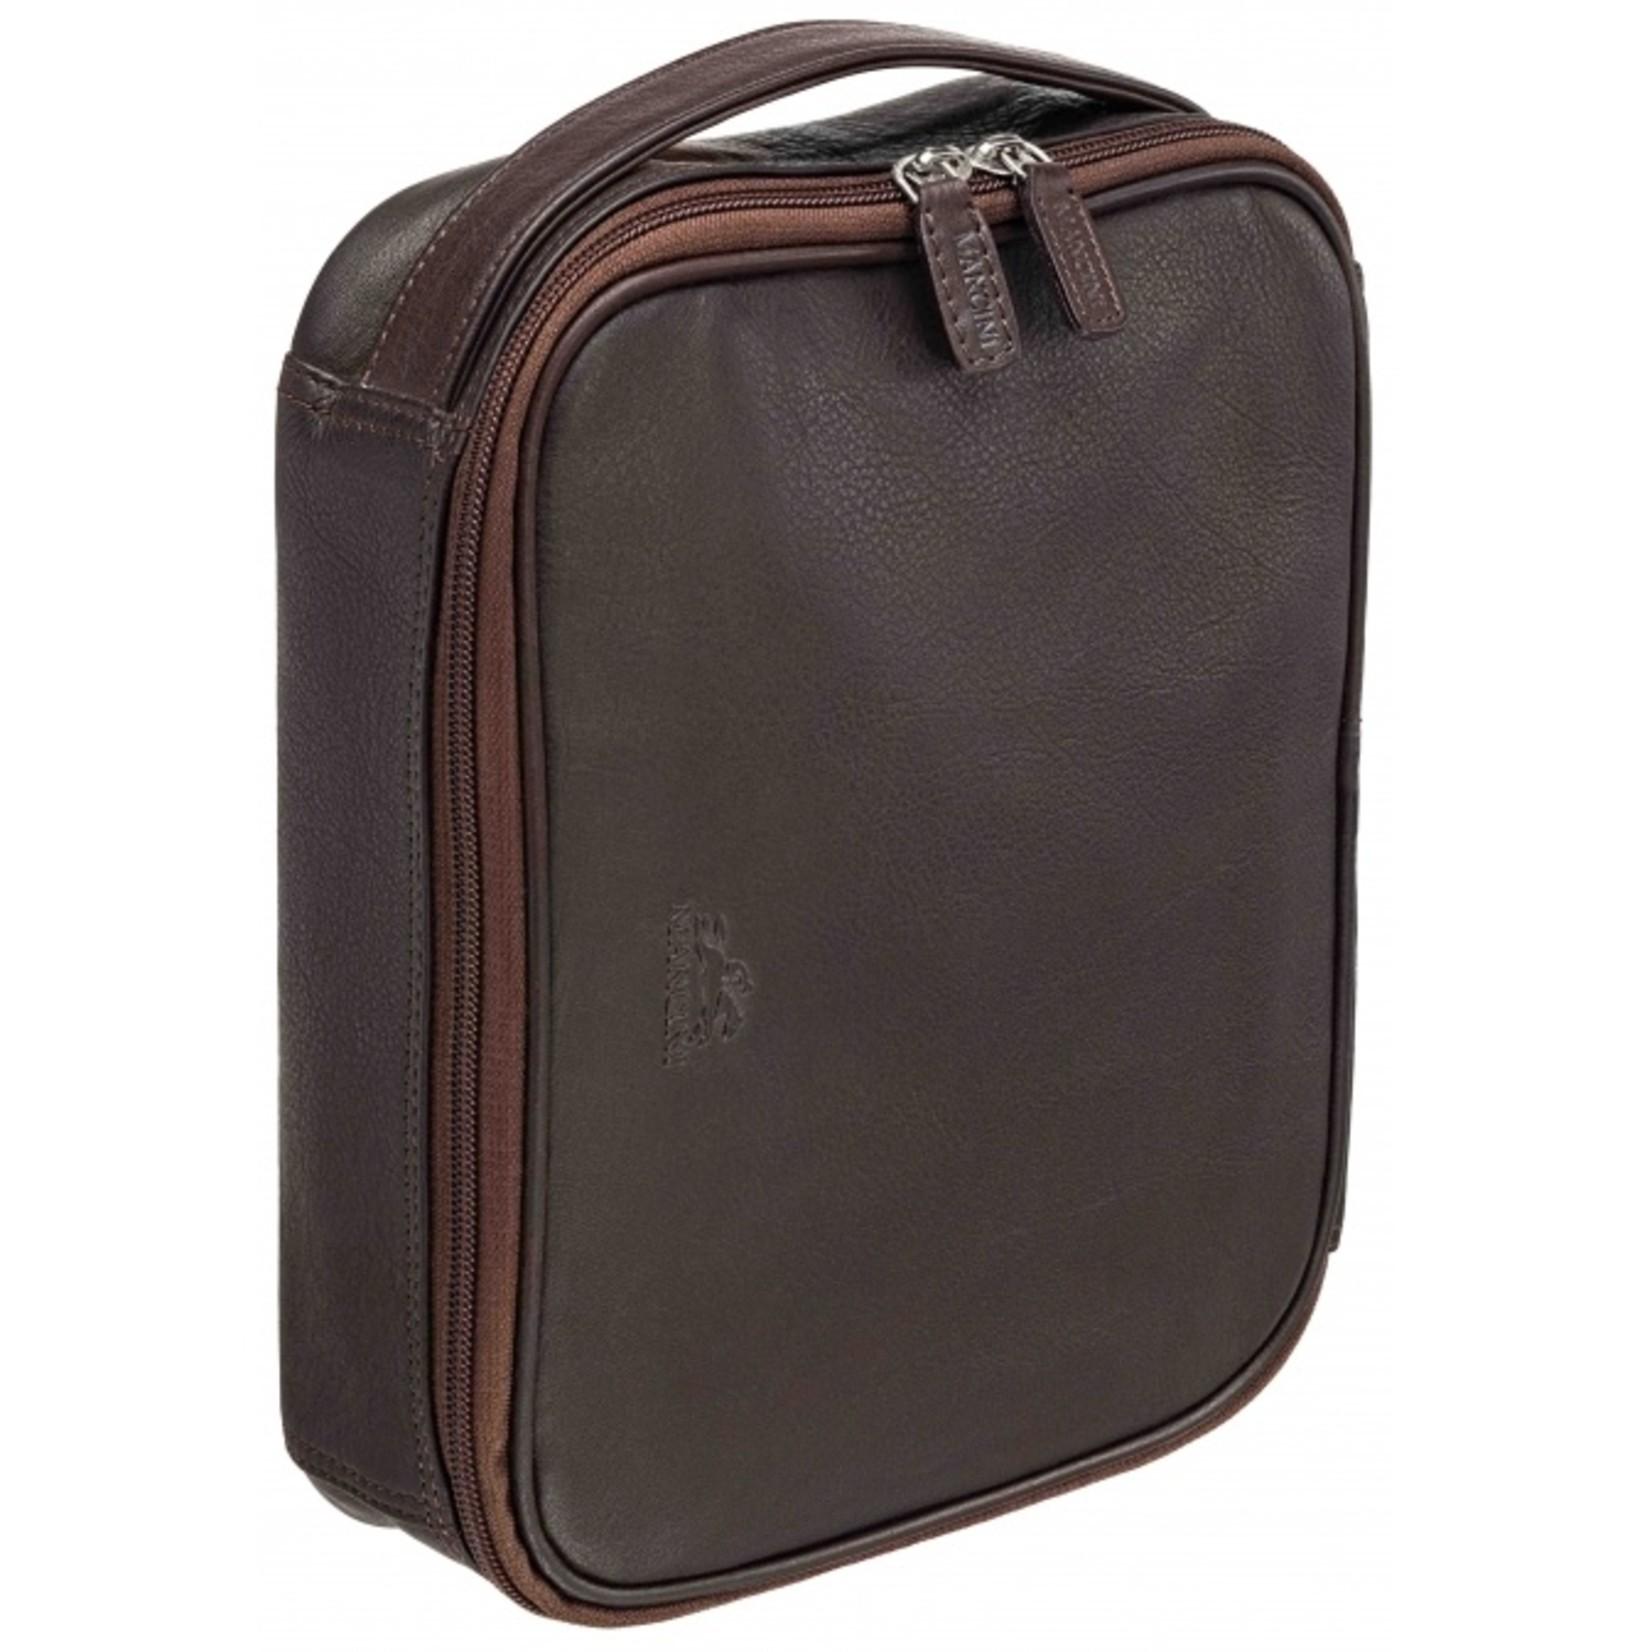 Mancini Mancini 98898 Zippered Toiletry Bag